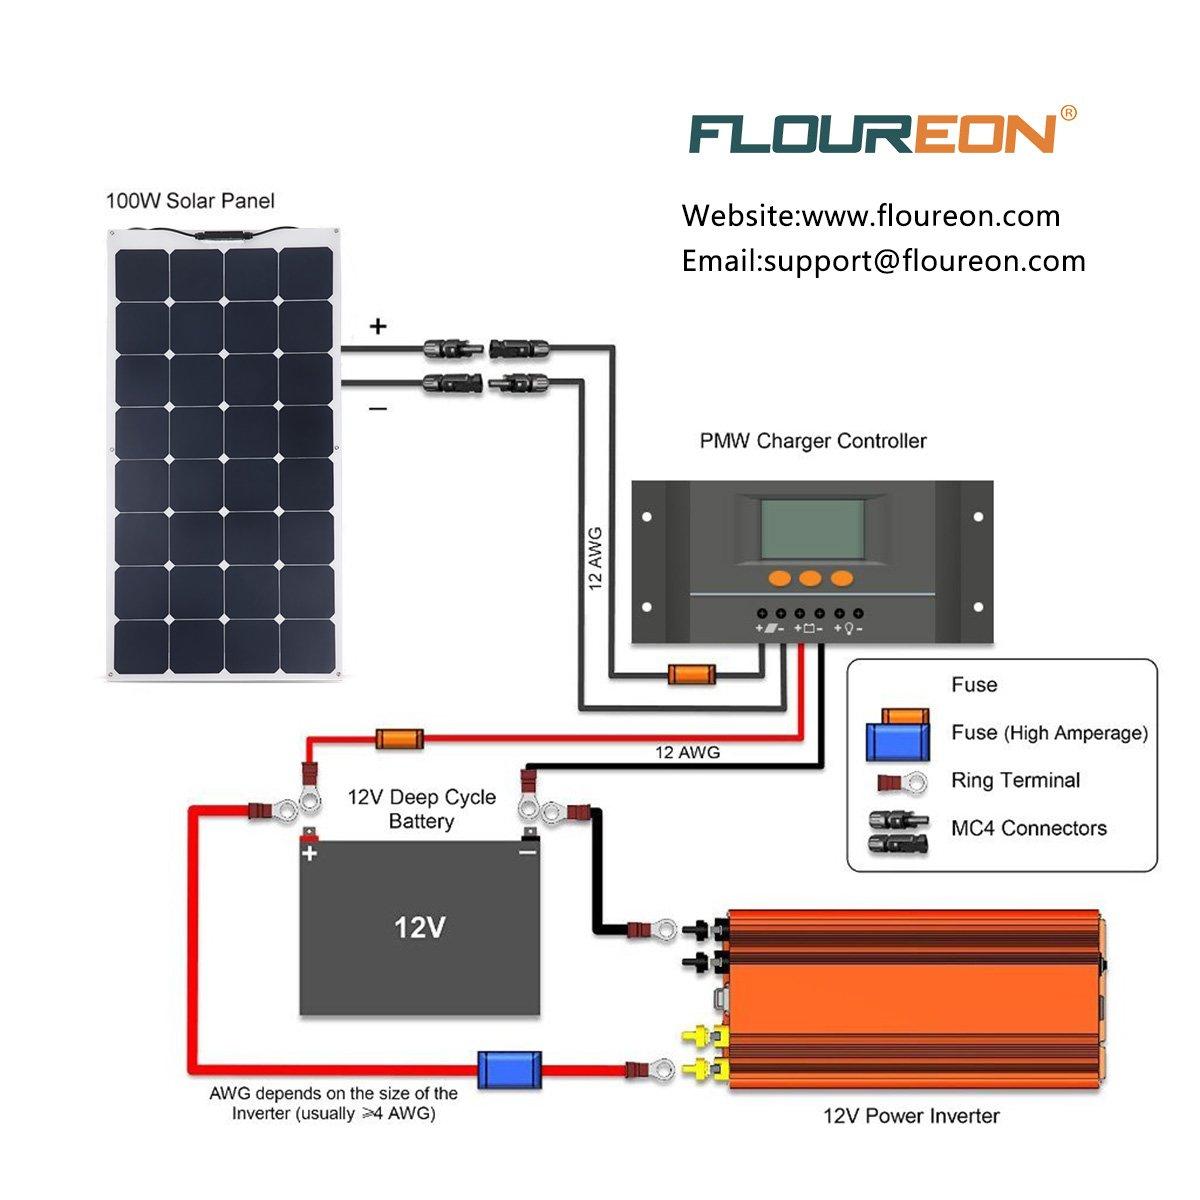 100w 12v solar wiring diagram wiring diagrams best amazon com floureon 100w 18v 12v solar panel charger sunpower cell 12v diagram wiring batterygm 100w 12v solar wiring diagram